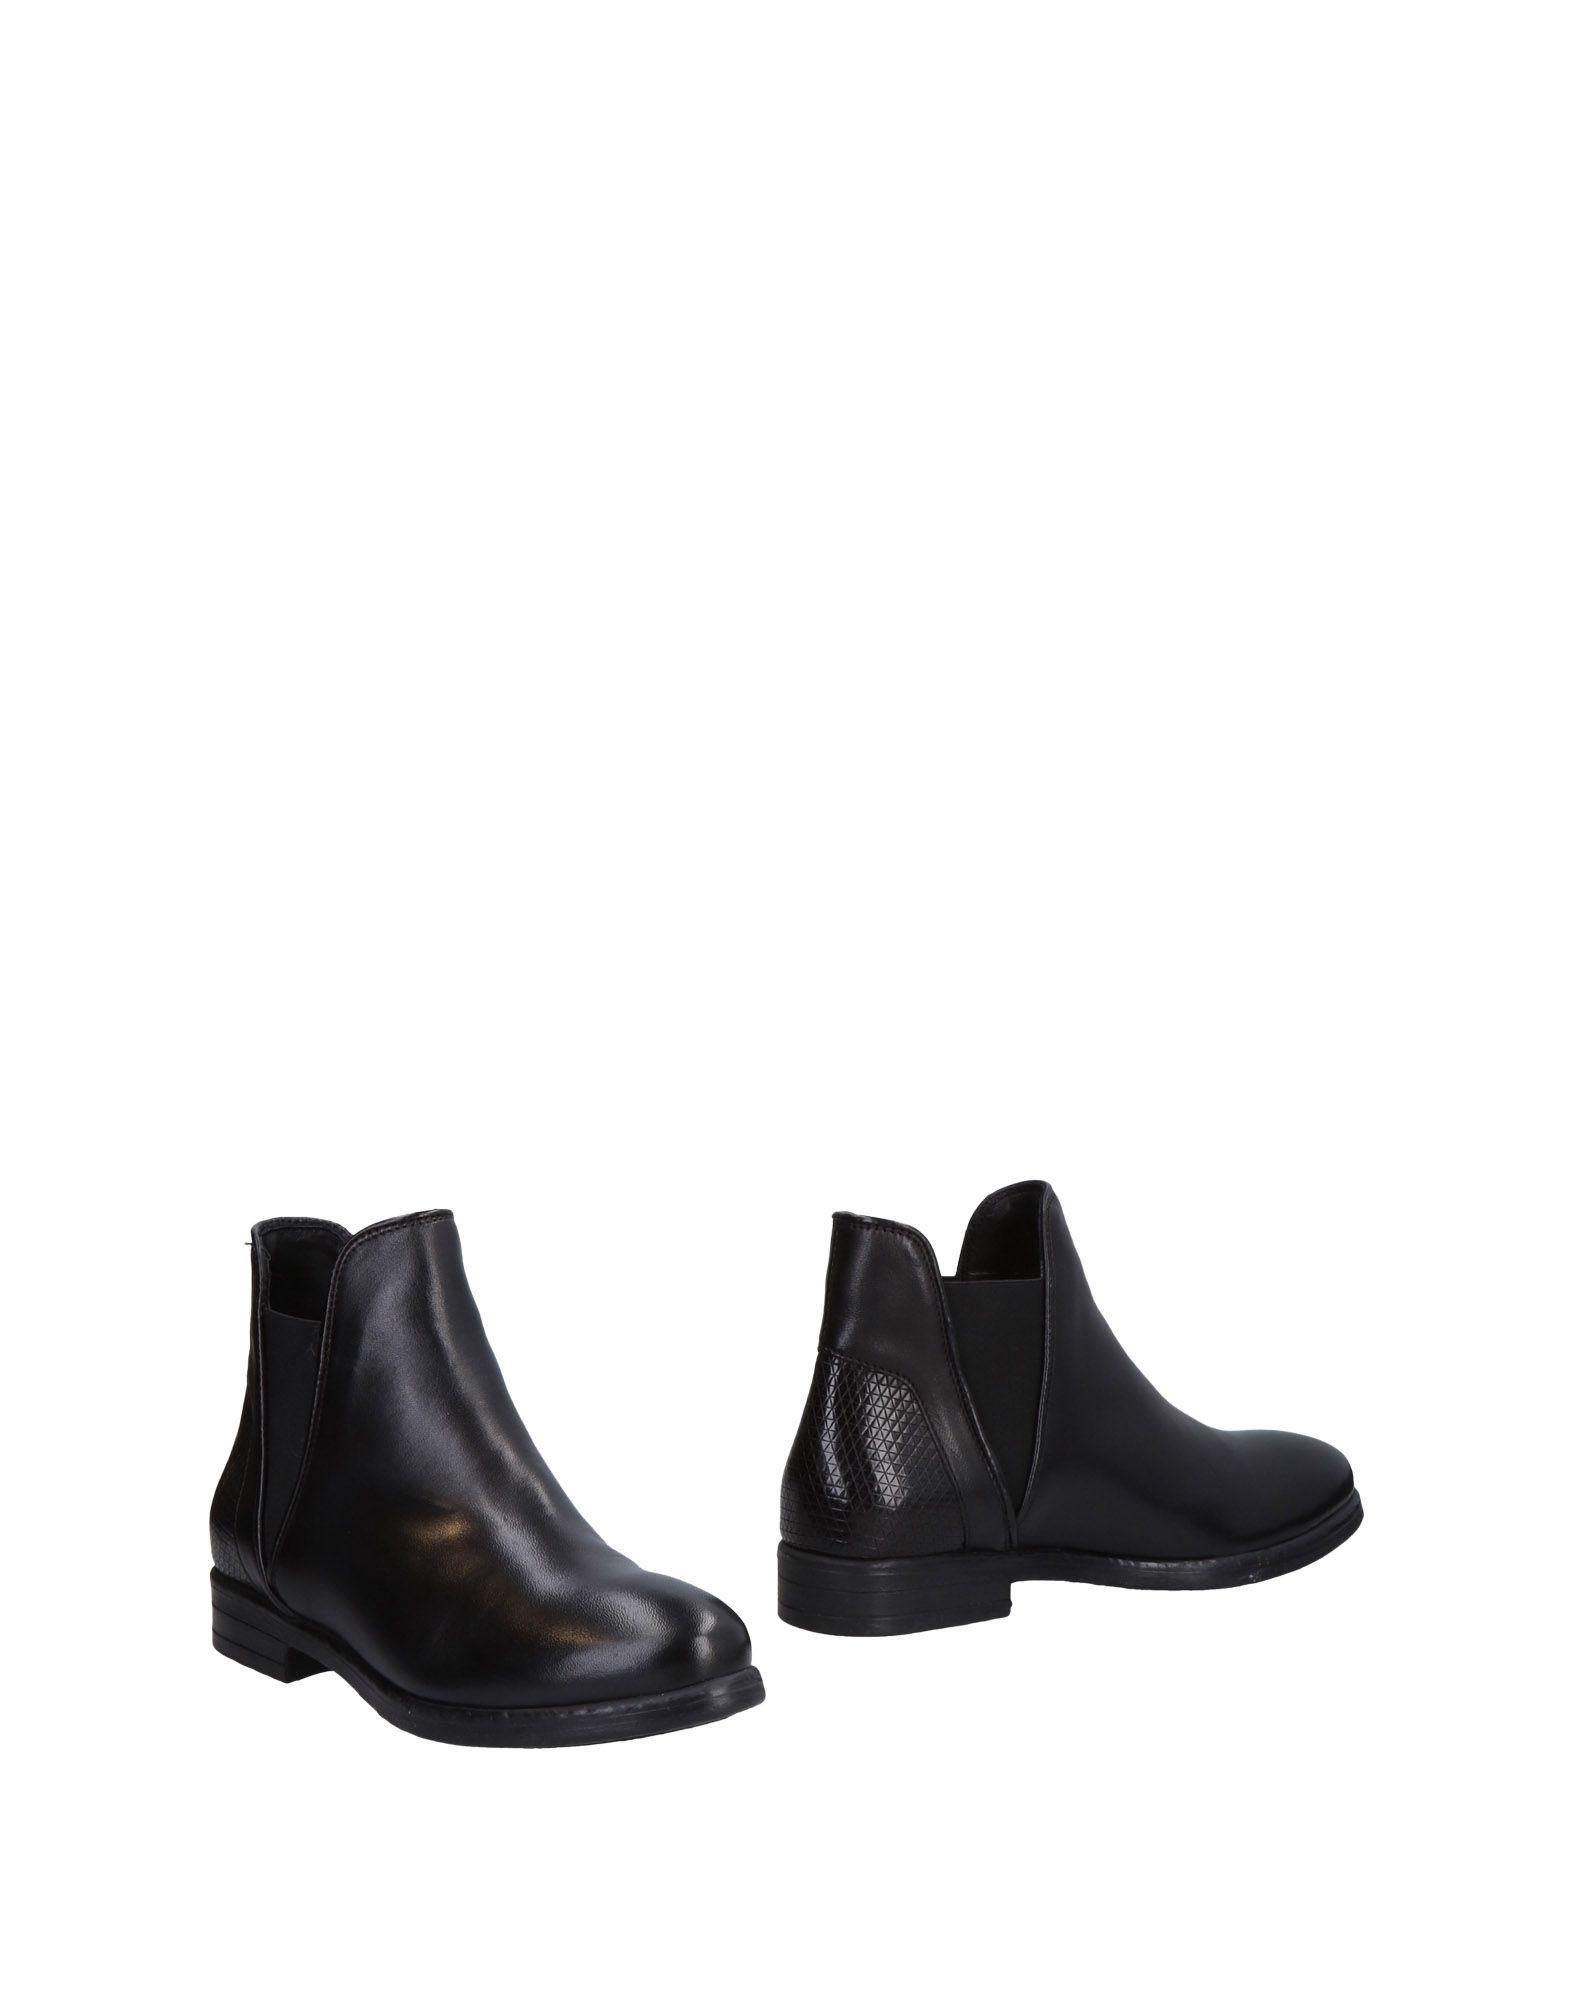 Fabbrica Deicolli Chelsea Boots Damen  11467256MO Qualität Gute Qualität 11467256MO beliebte Schuhe fb939c